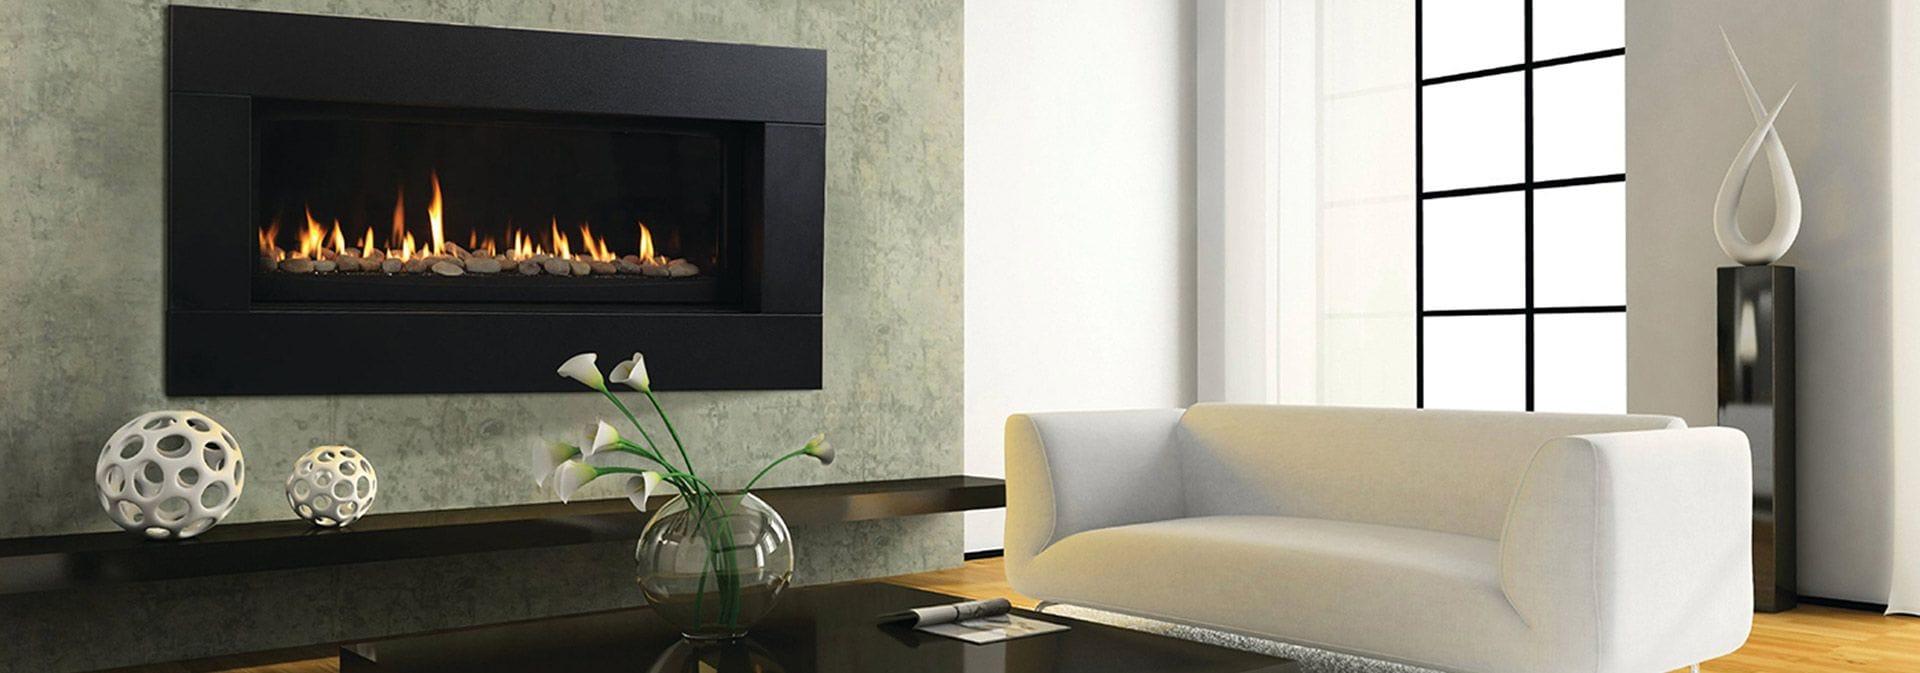 stone veneer fireplaces brampton fireplaces mississauga